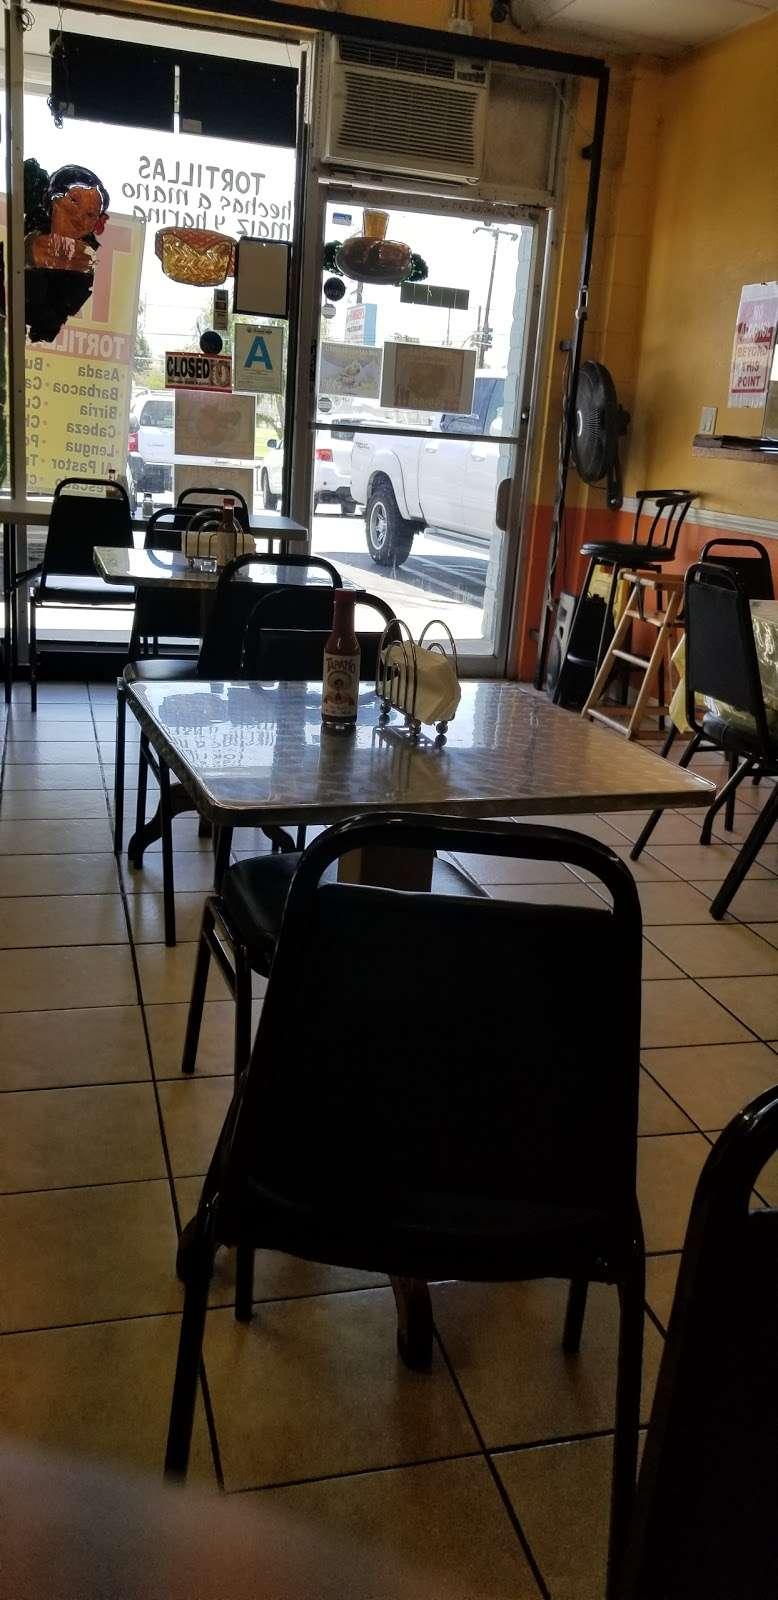 Carnitas Don Cuco - restaurant  | Photo 10 of 10 | Address: 10981 Glenoaks Blvd, Pacoima, CA 91331, USA | Phone: (747) 225-0825